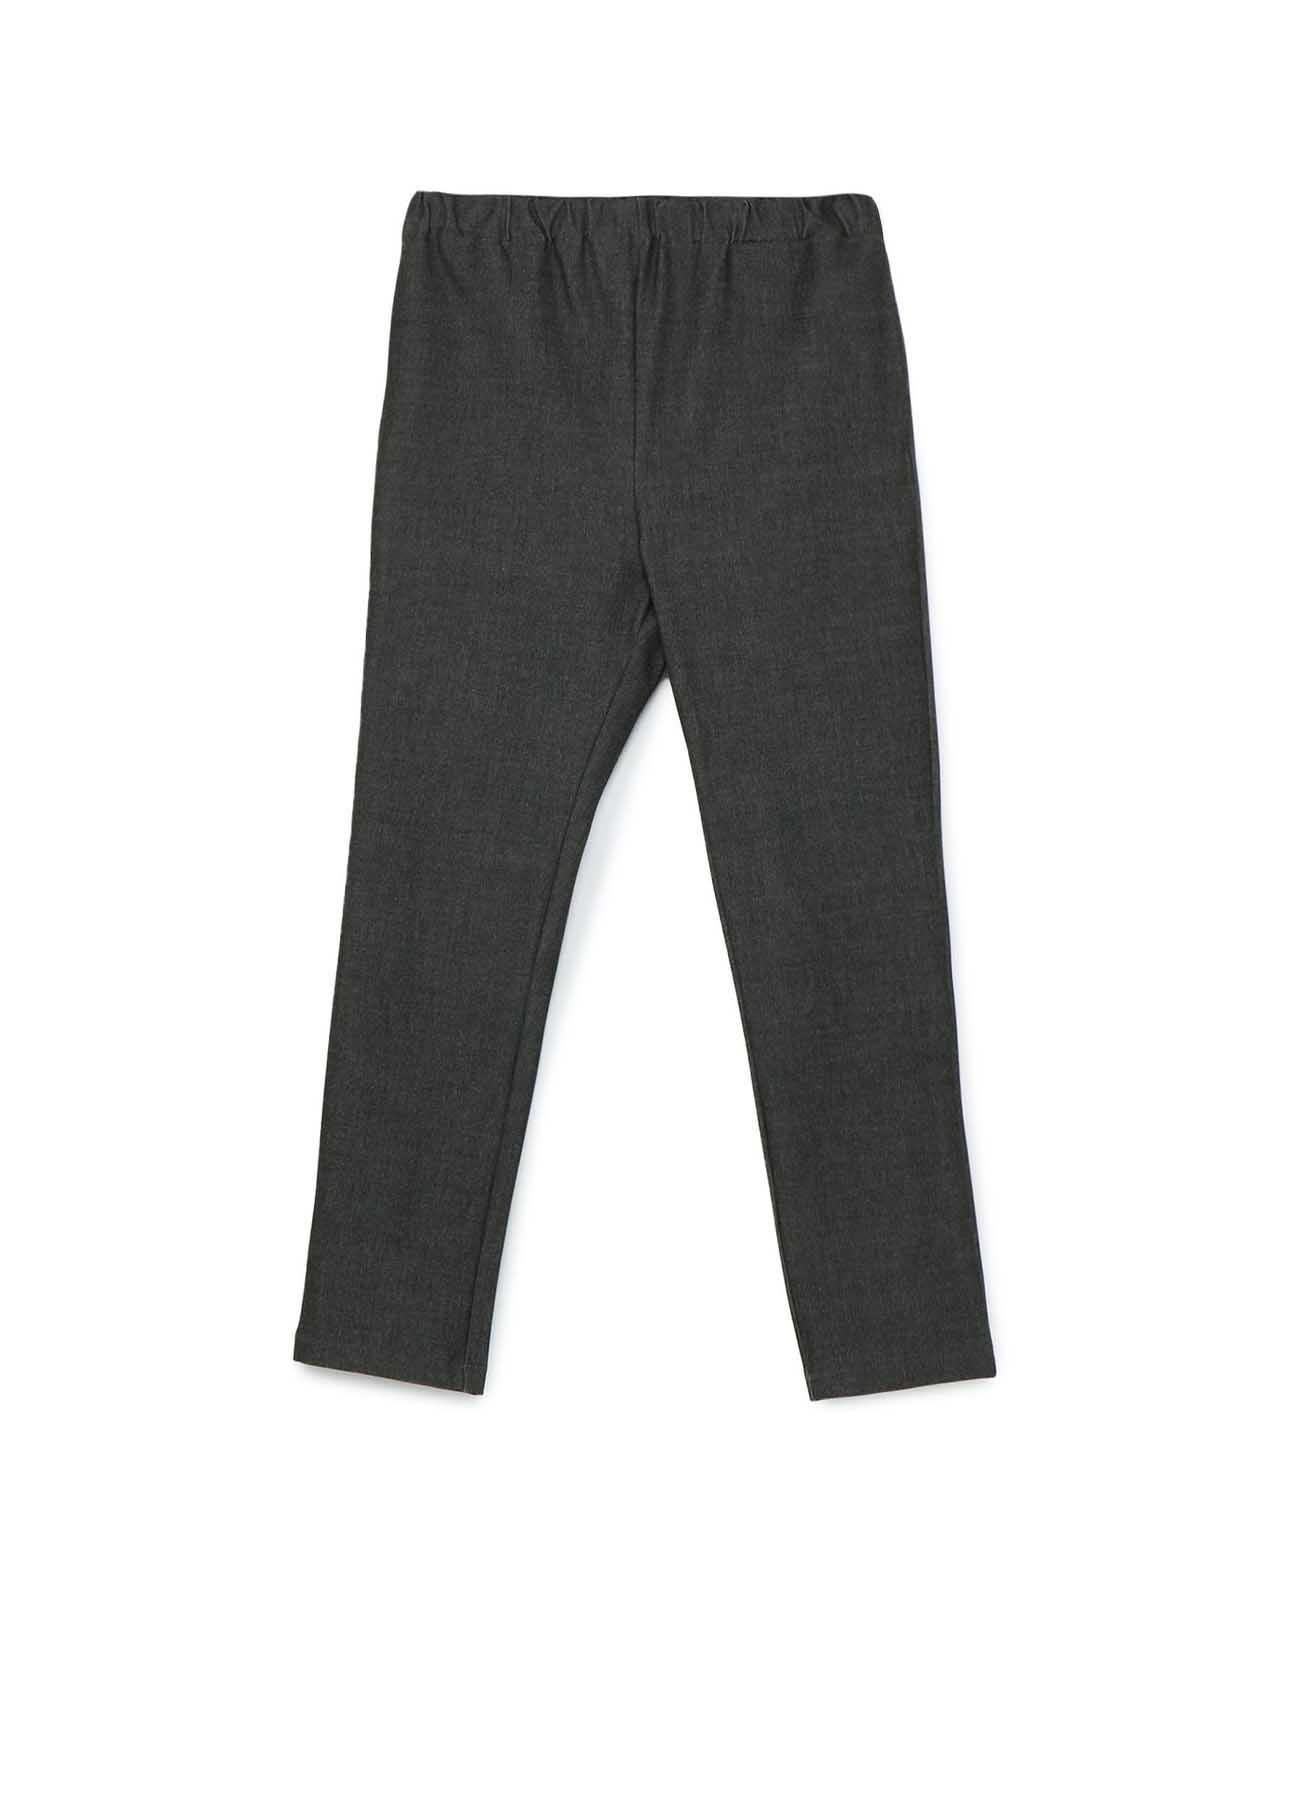 R/N STRETCH ANKLE LENGTH SLIM PANTS